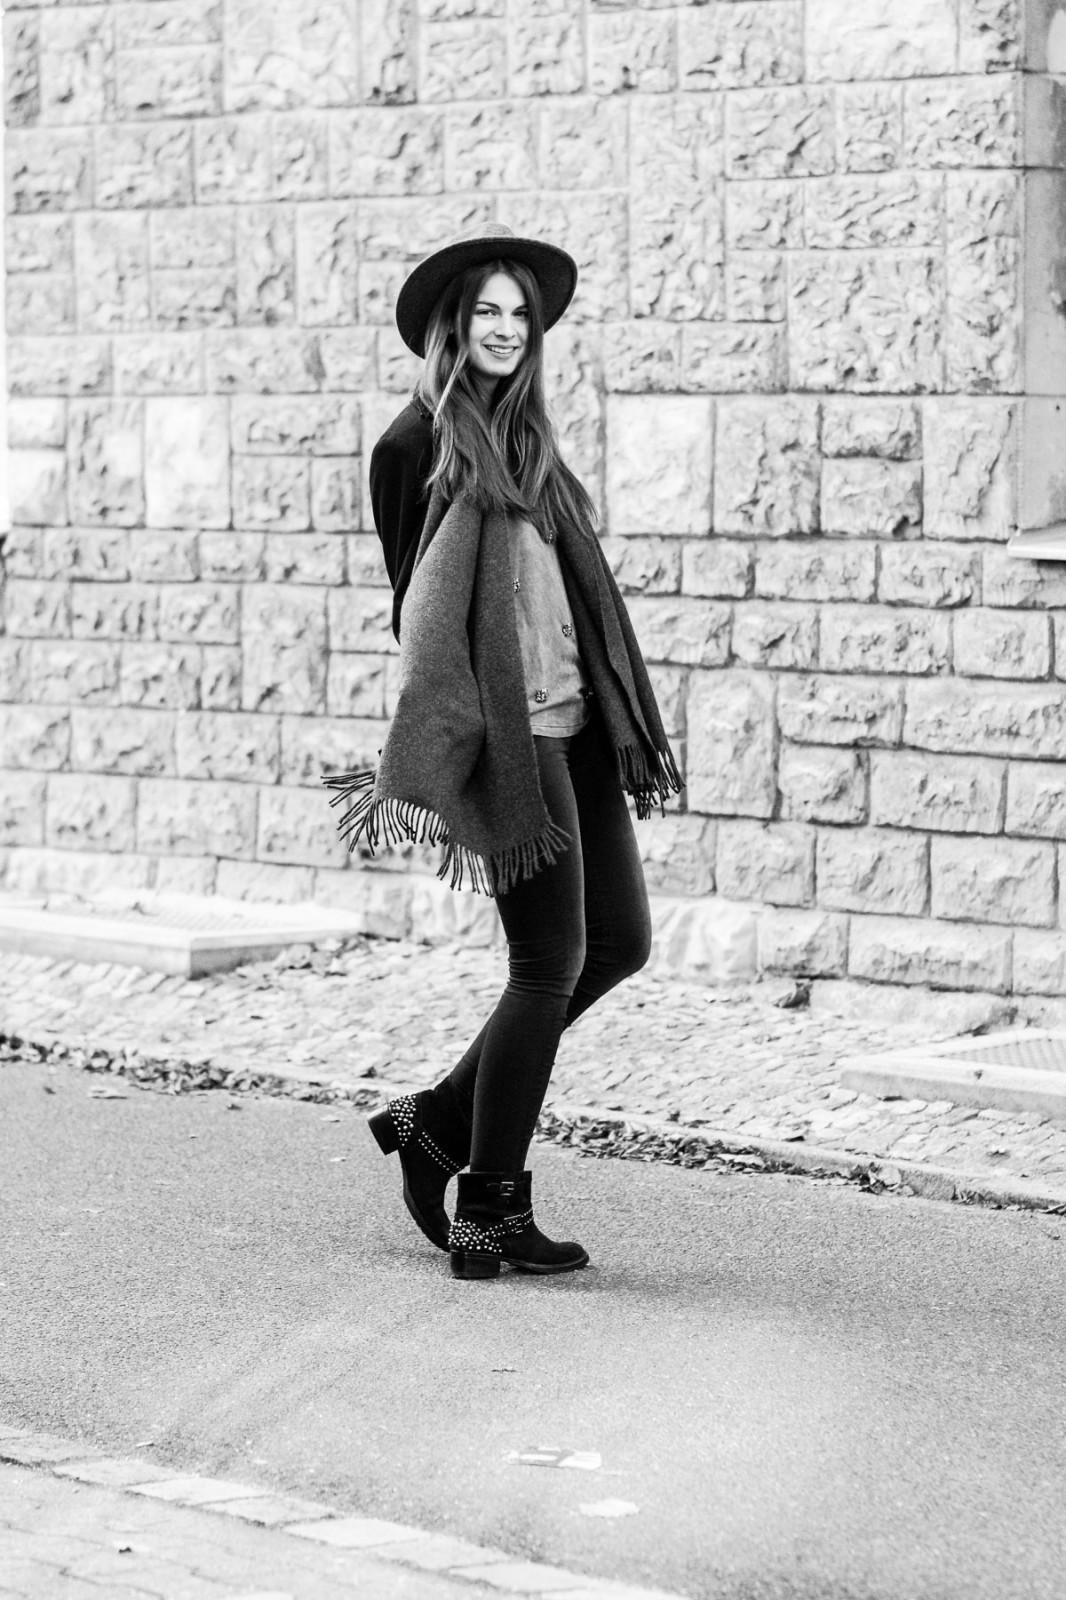 Schwarz-Weiß Fashion Photography